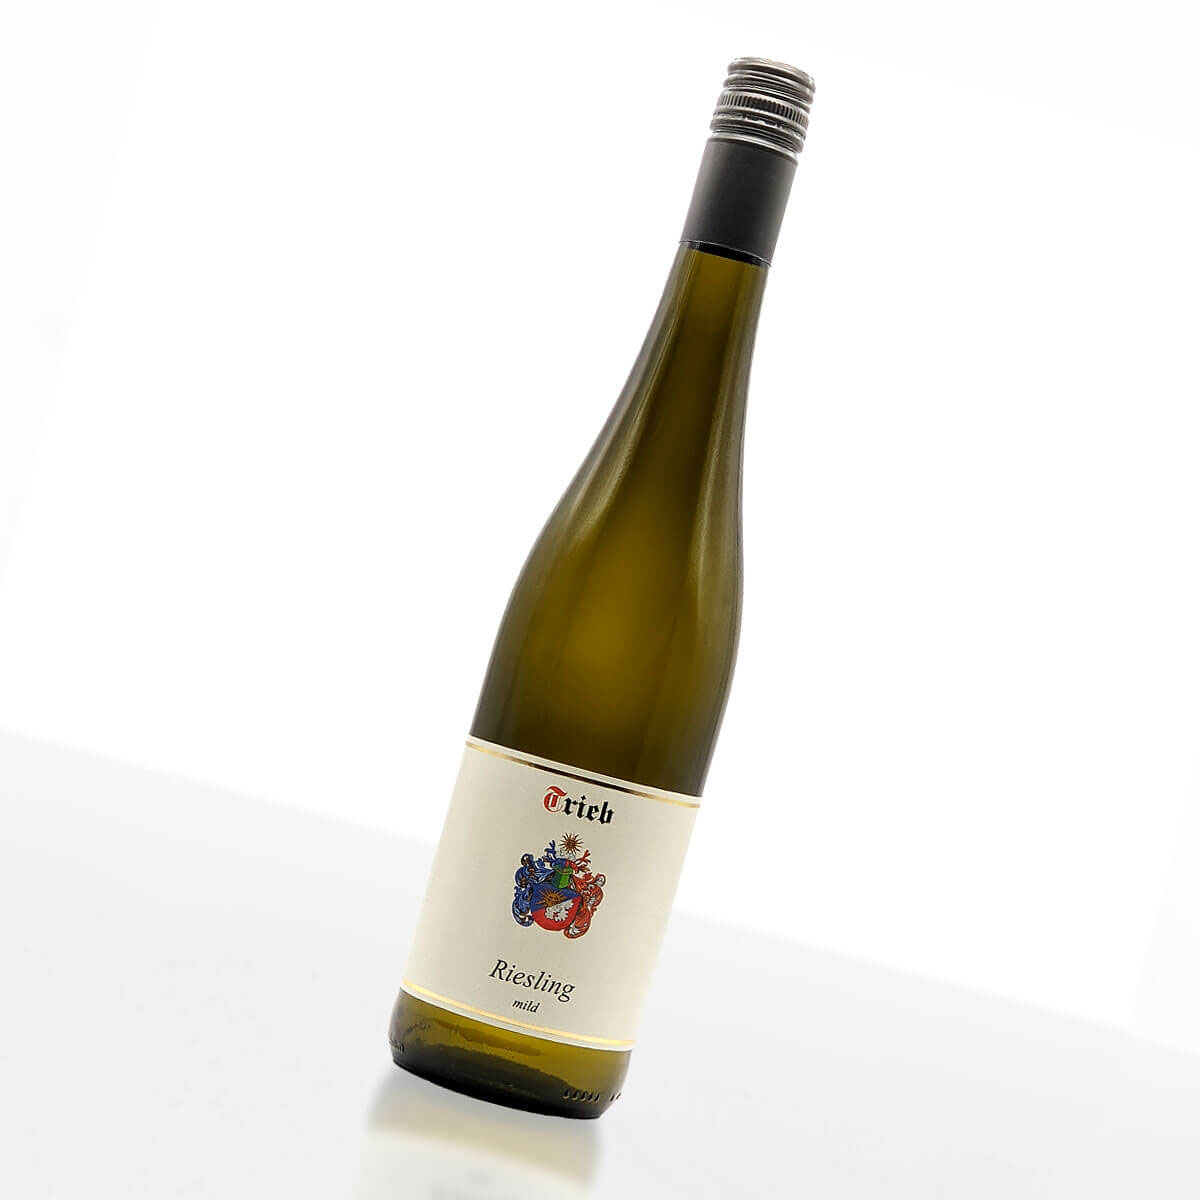 Riesling mild • Weingut Trieb